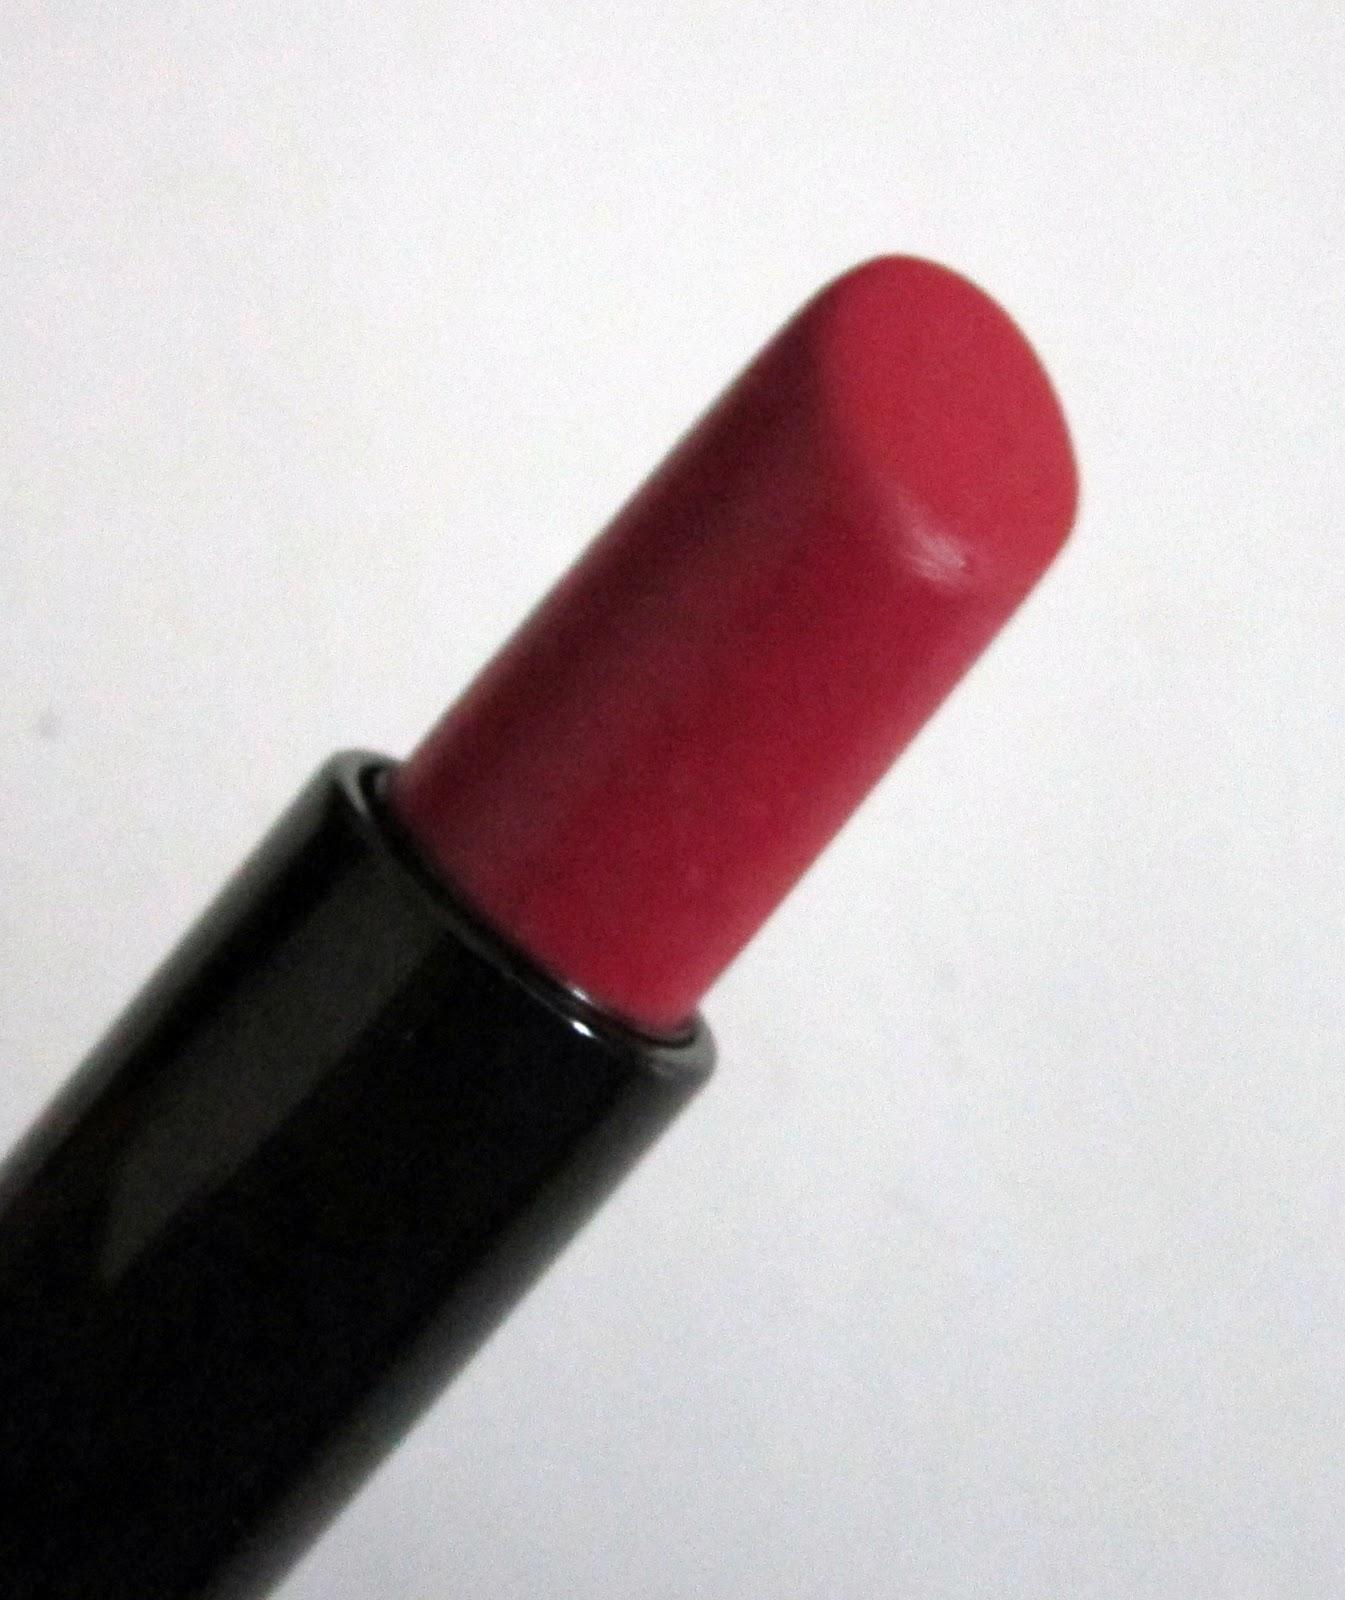 Indian Beauty Blog Red Hot Deborah Milano Lipstick Rosetto Atomic